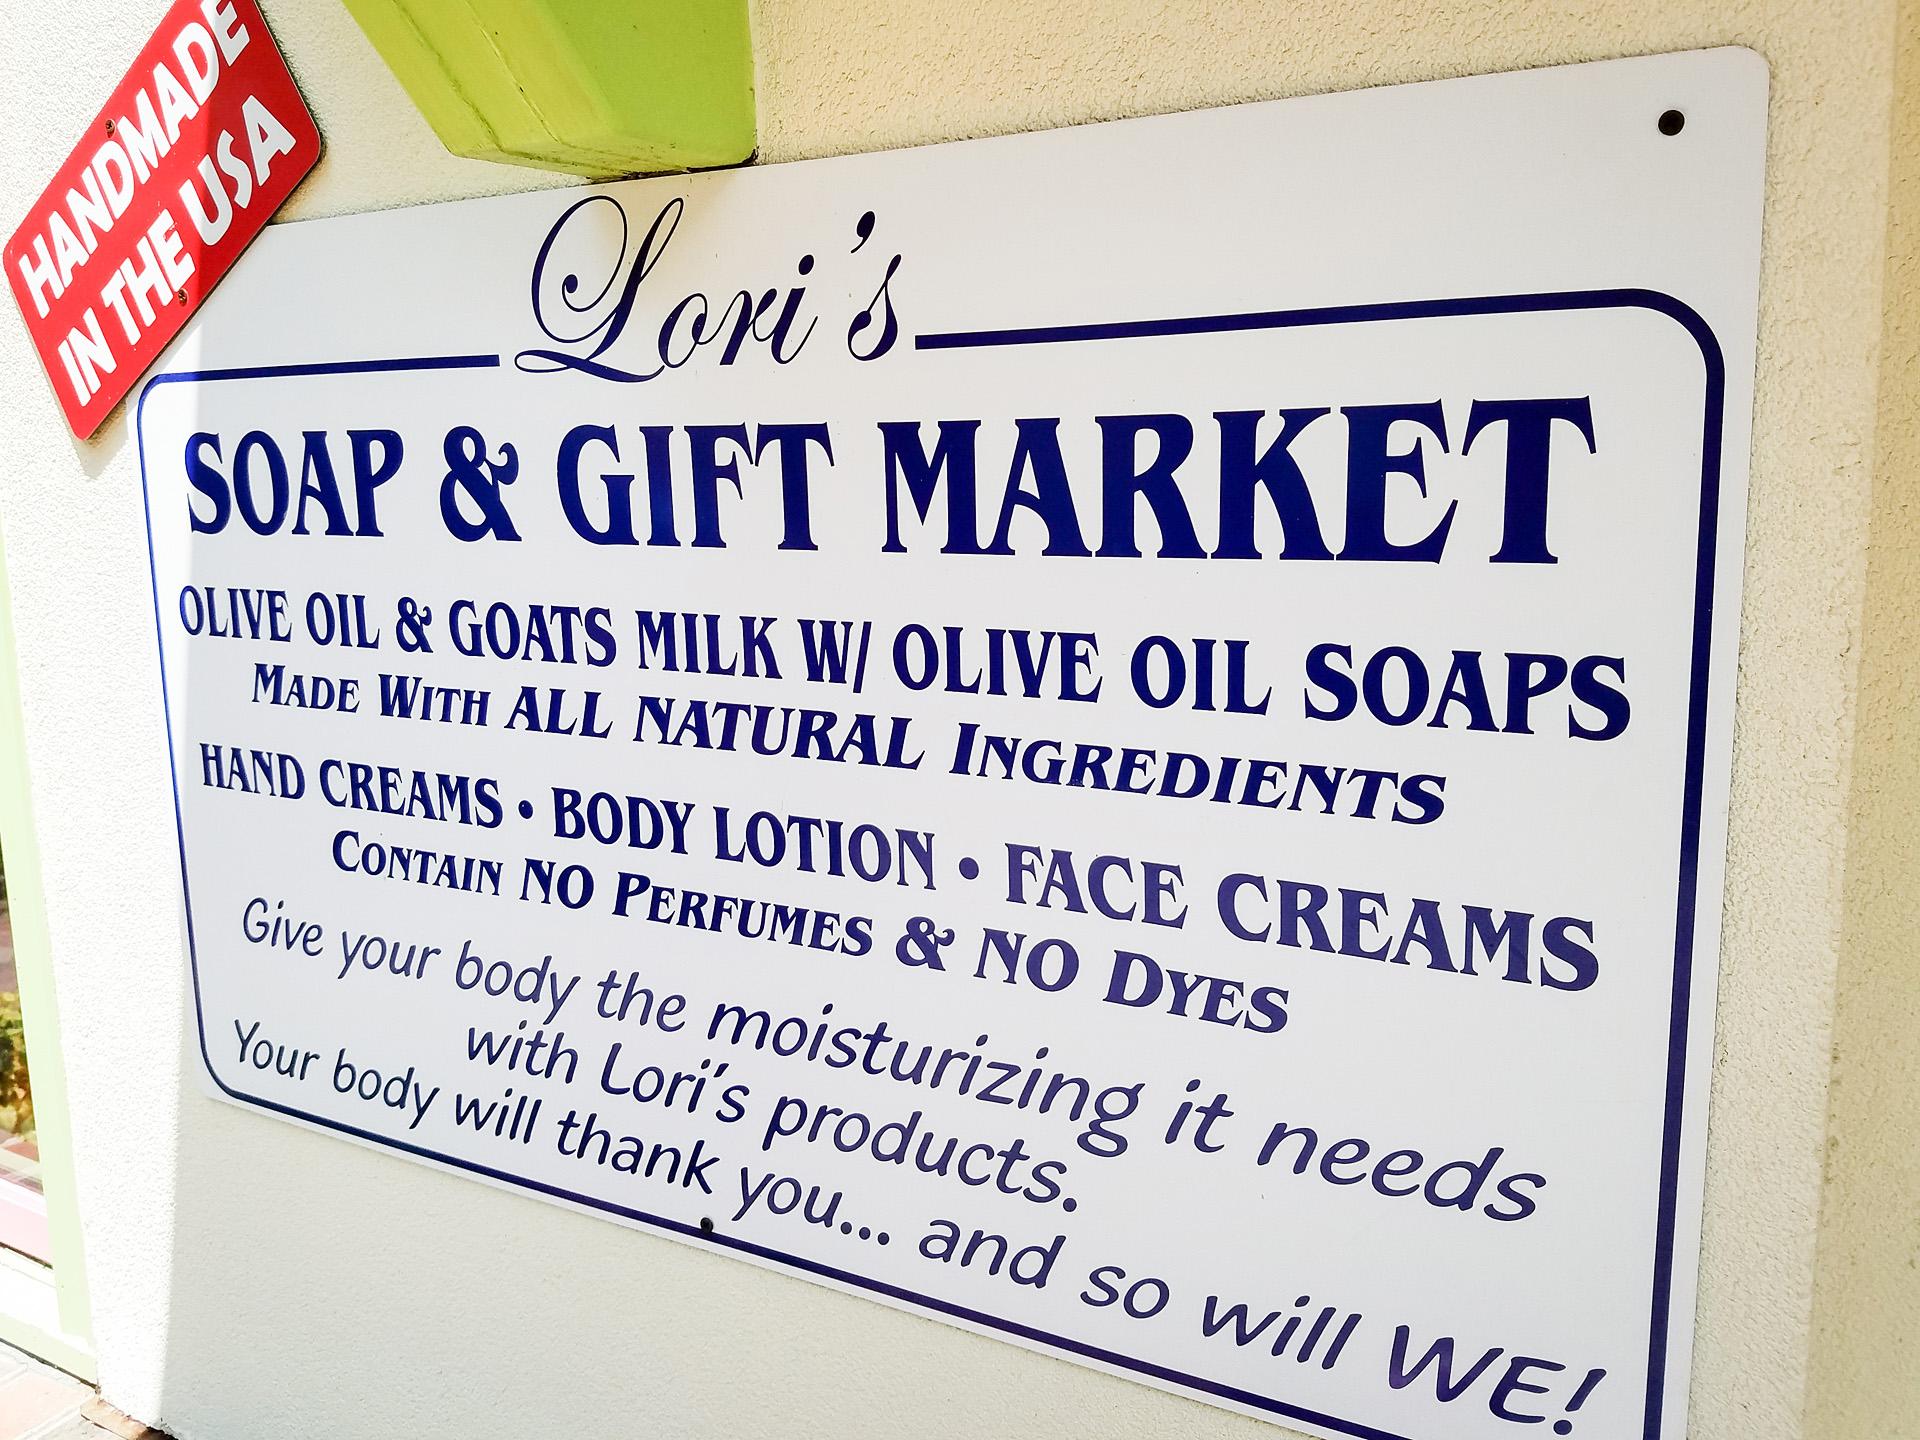 Grand village shops Branson MO (4).jpg